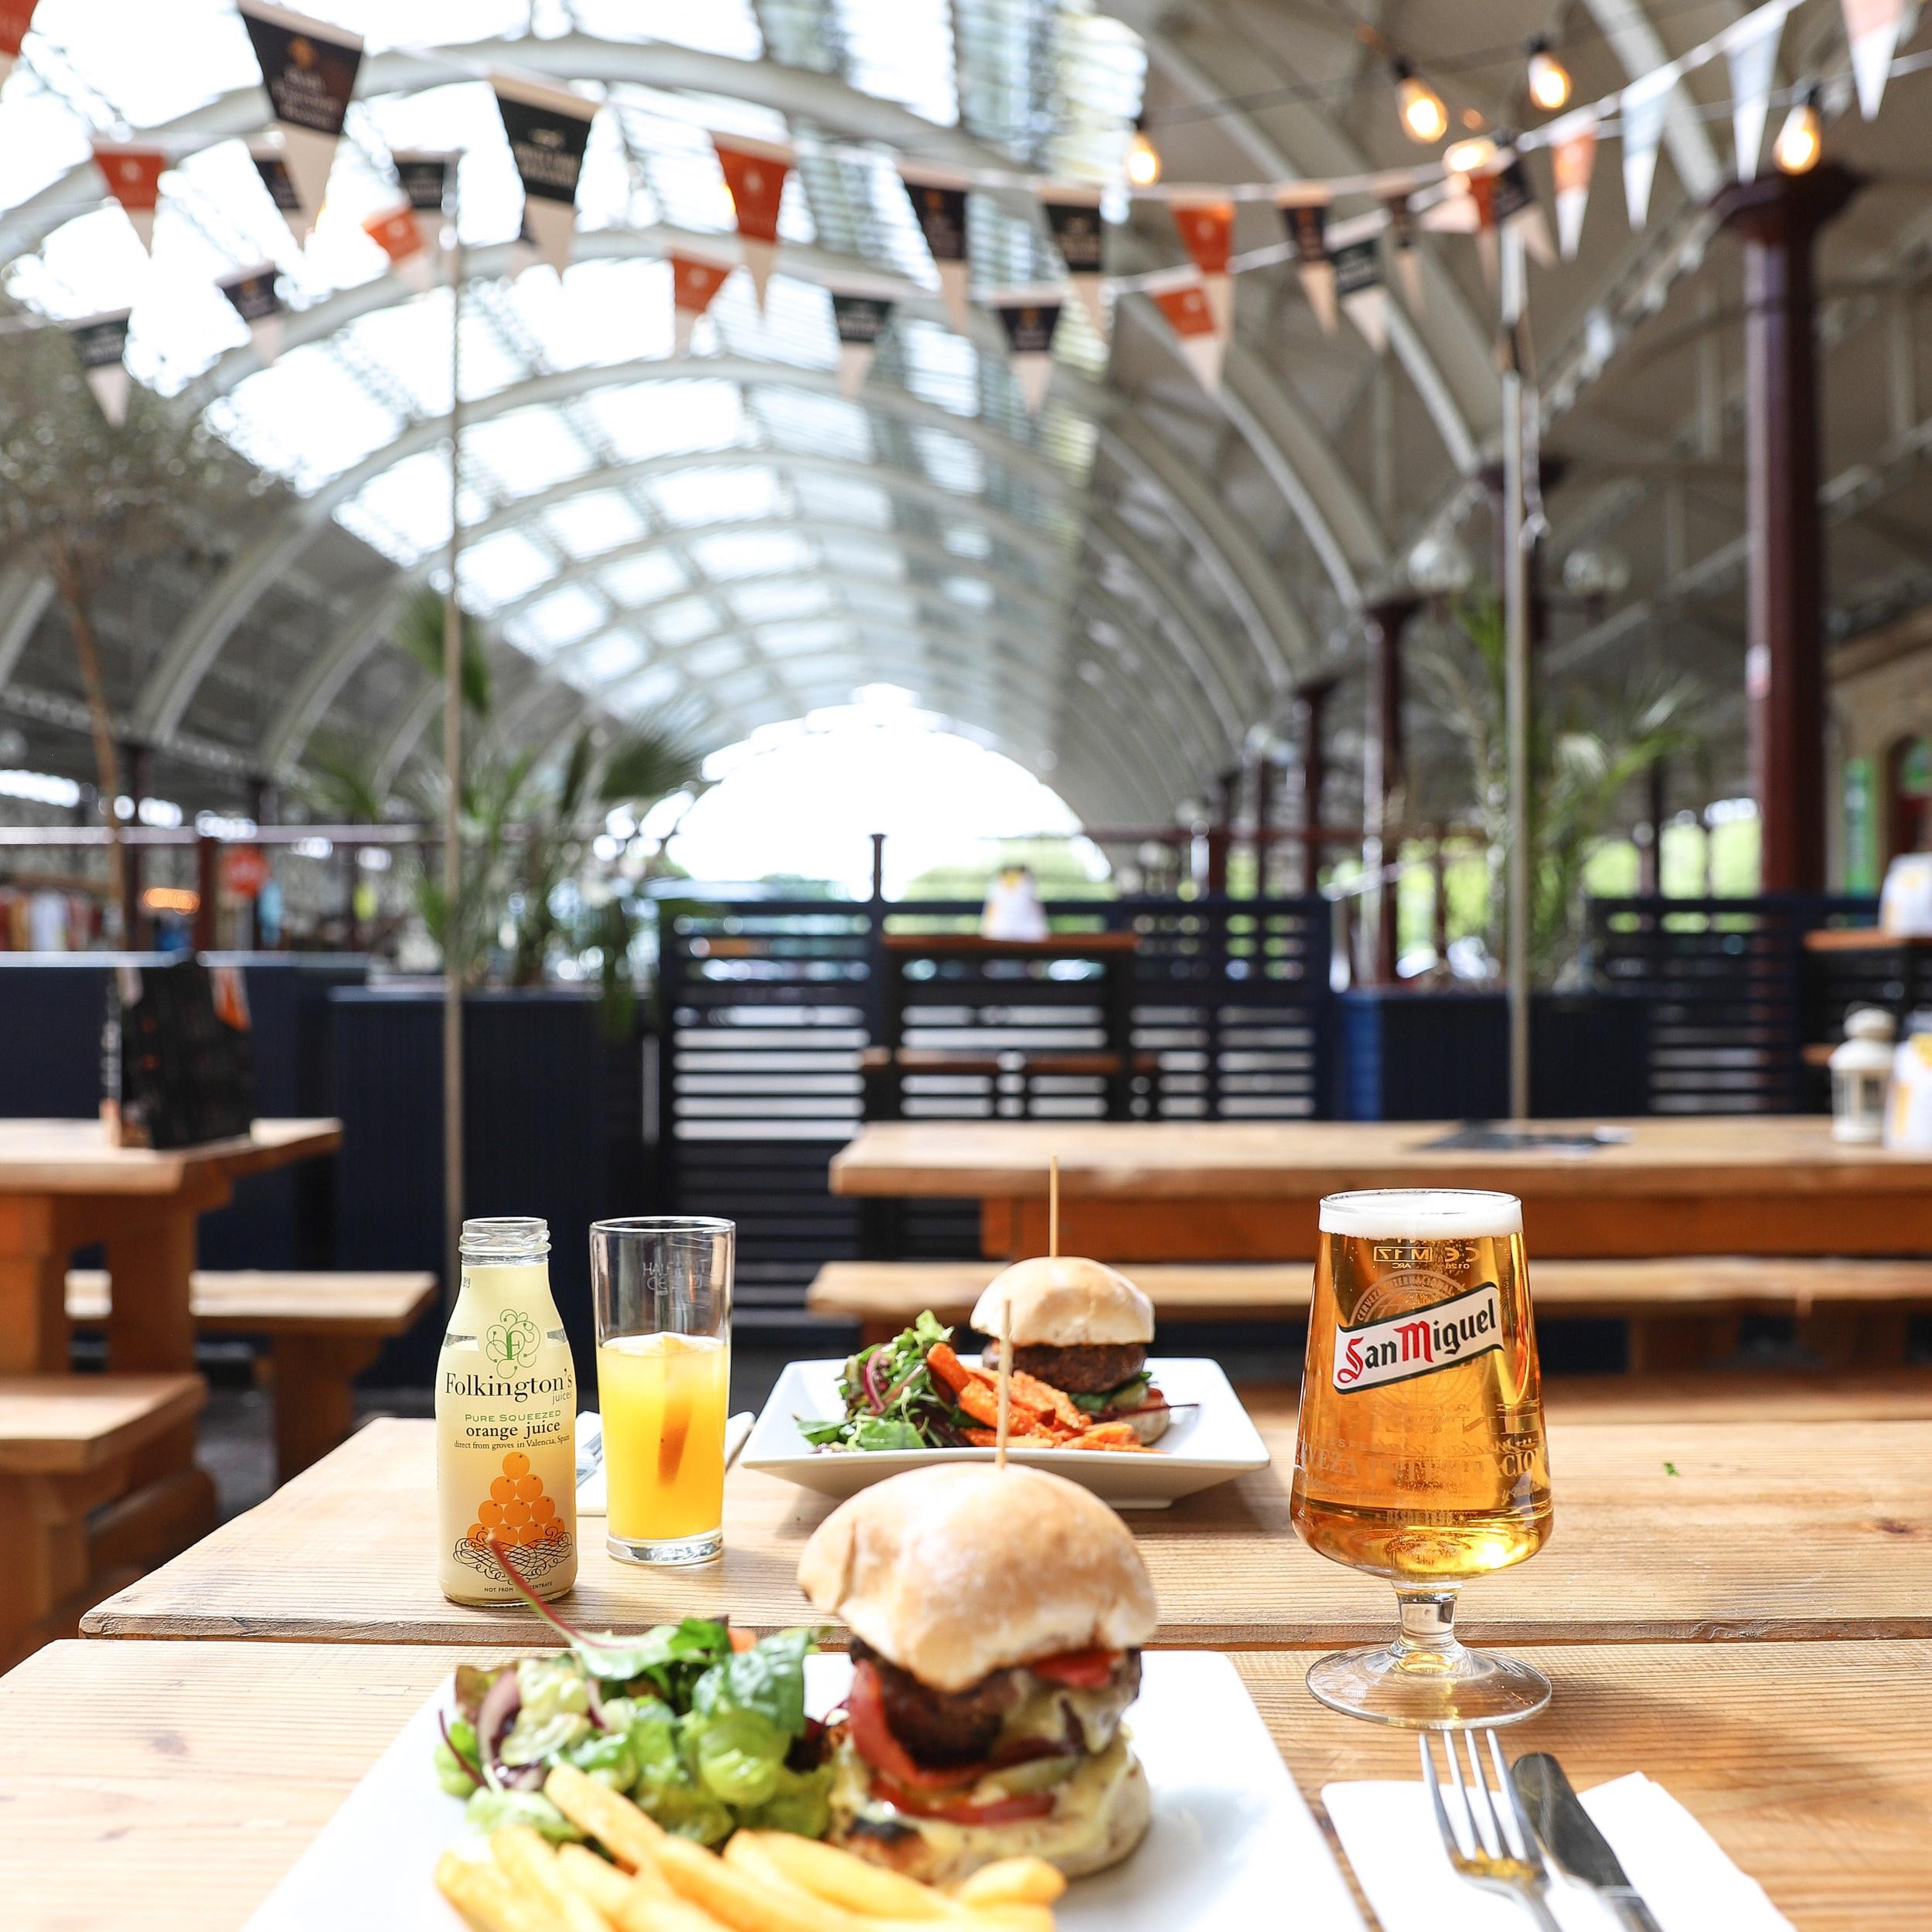 Burgers at Green Park Brasserie's alfresco terrace